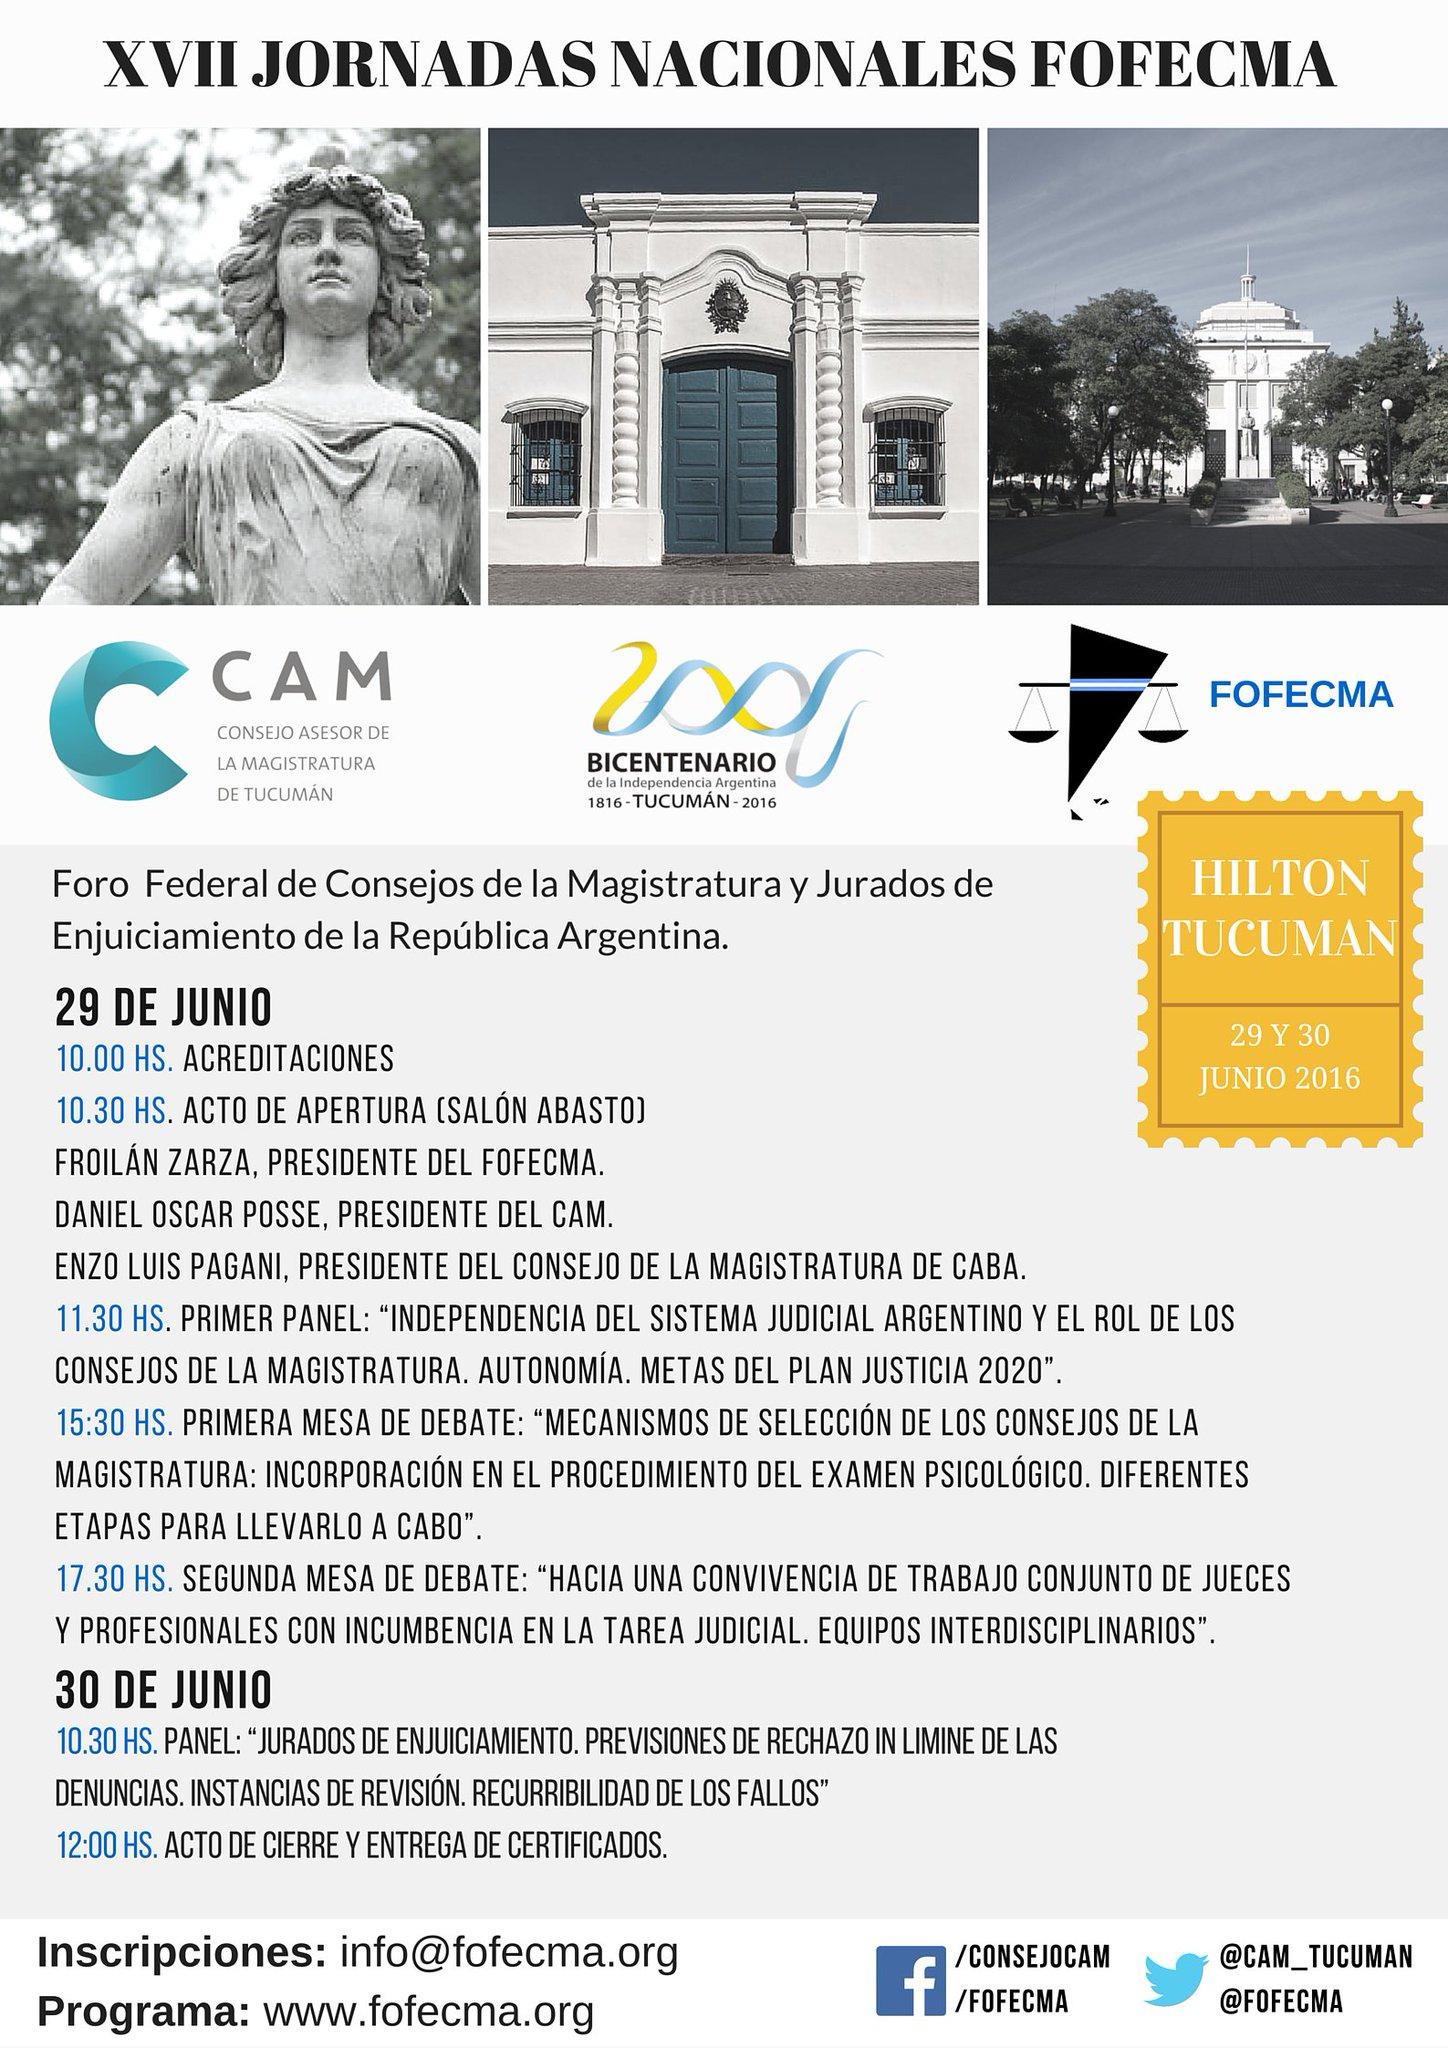 Para participar de las Jornadas @fofecma de 29 y 30/6 inscribirse en info@fofecma.org https://t.co/w0Qqxk9lI9